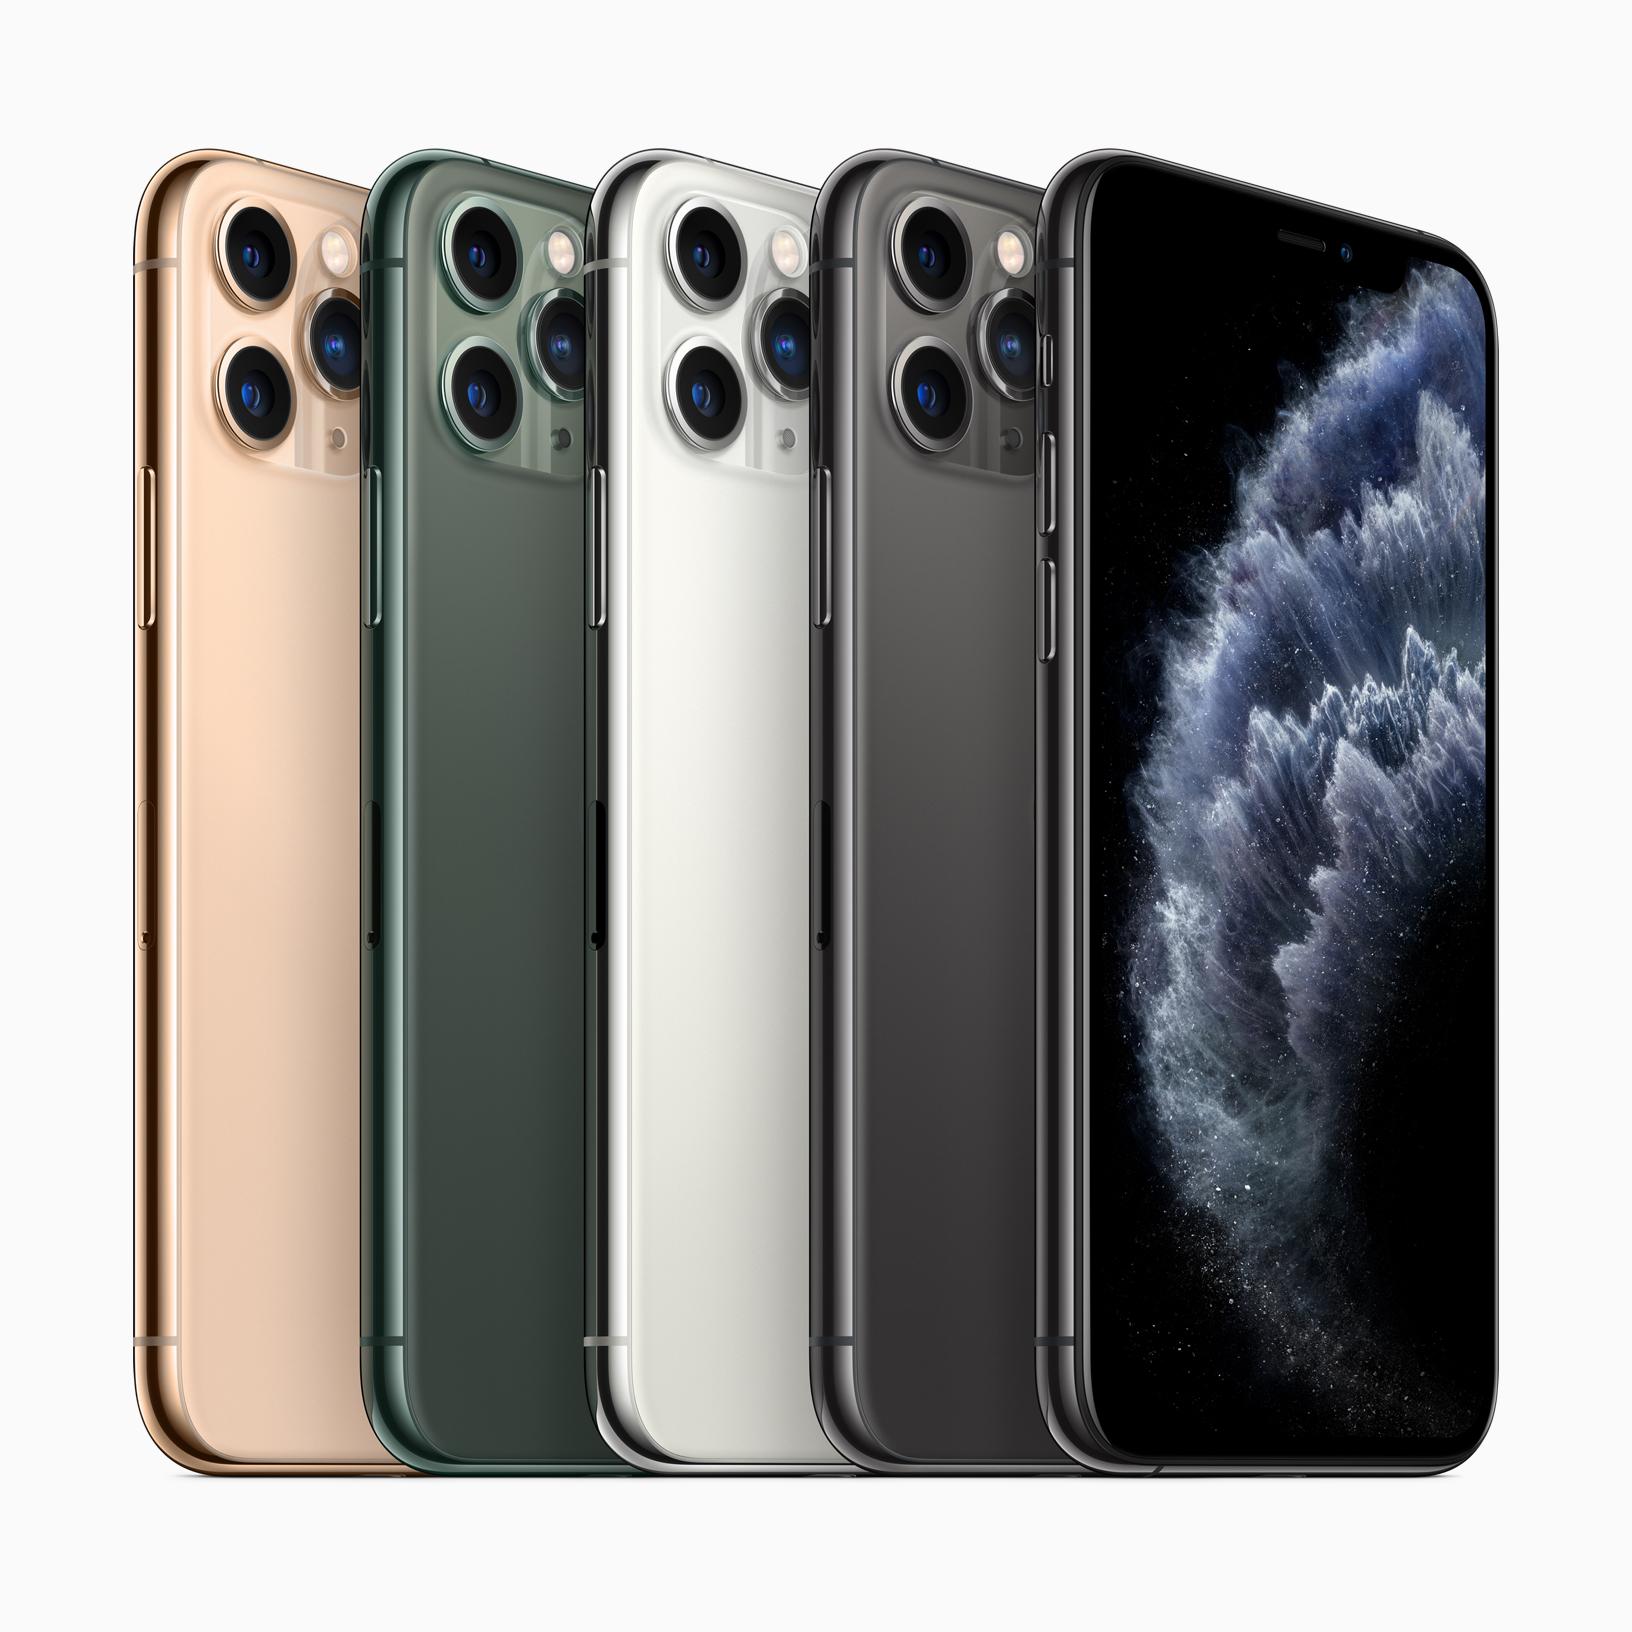 iPhone-11-Pro-colors.jpg